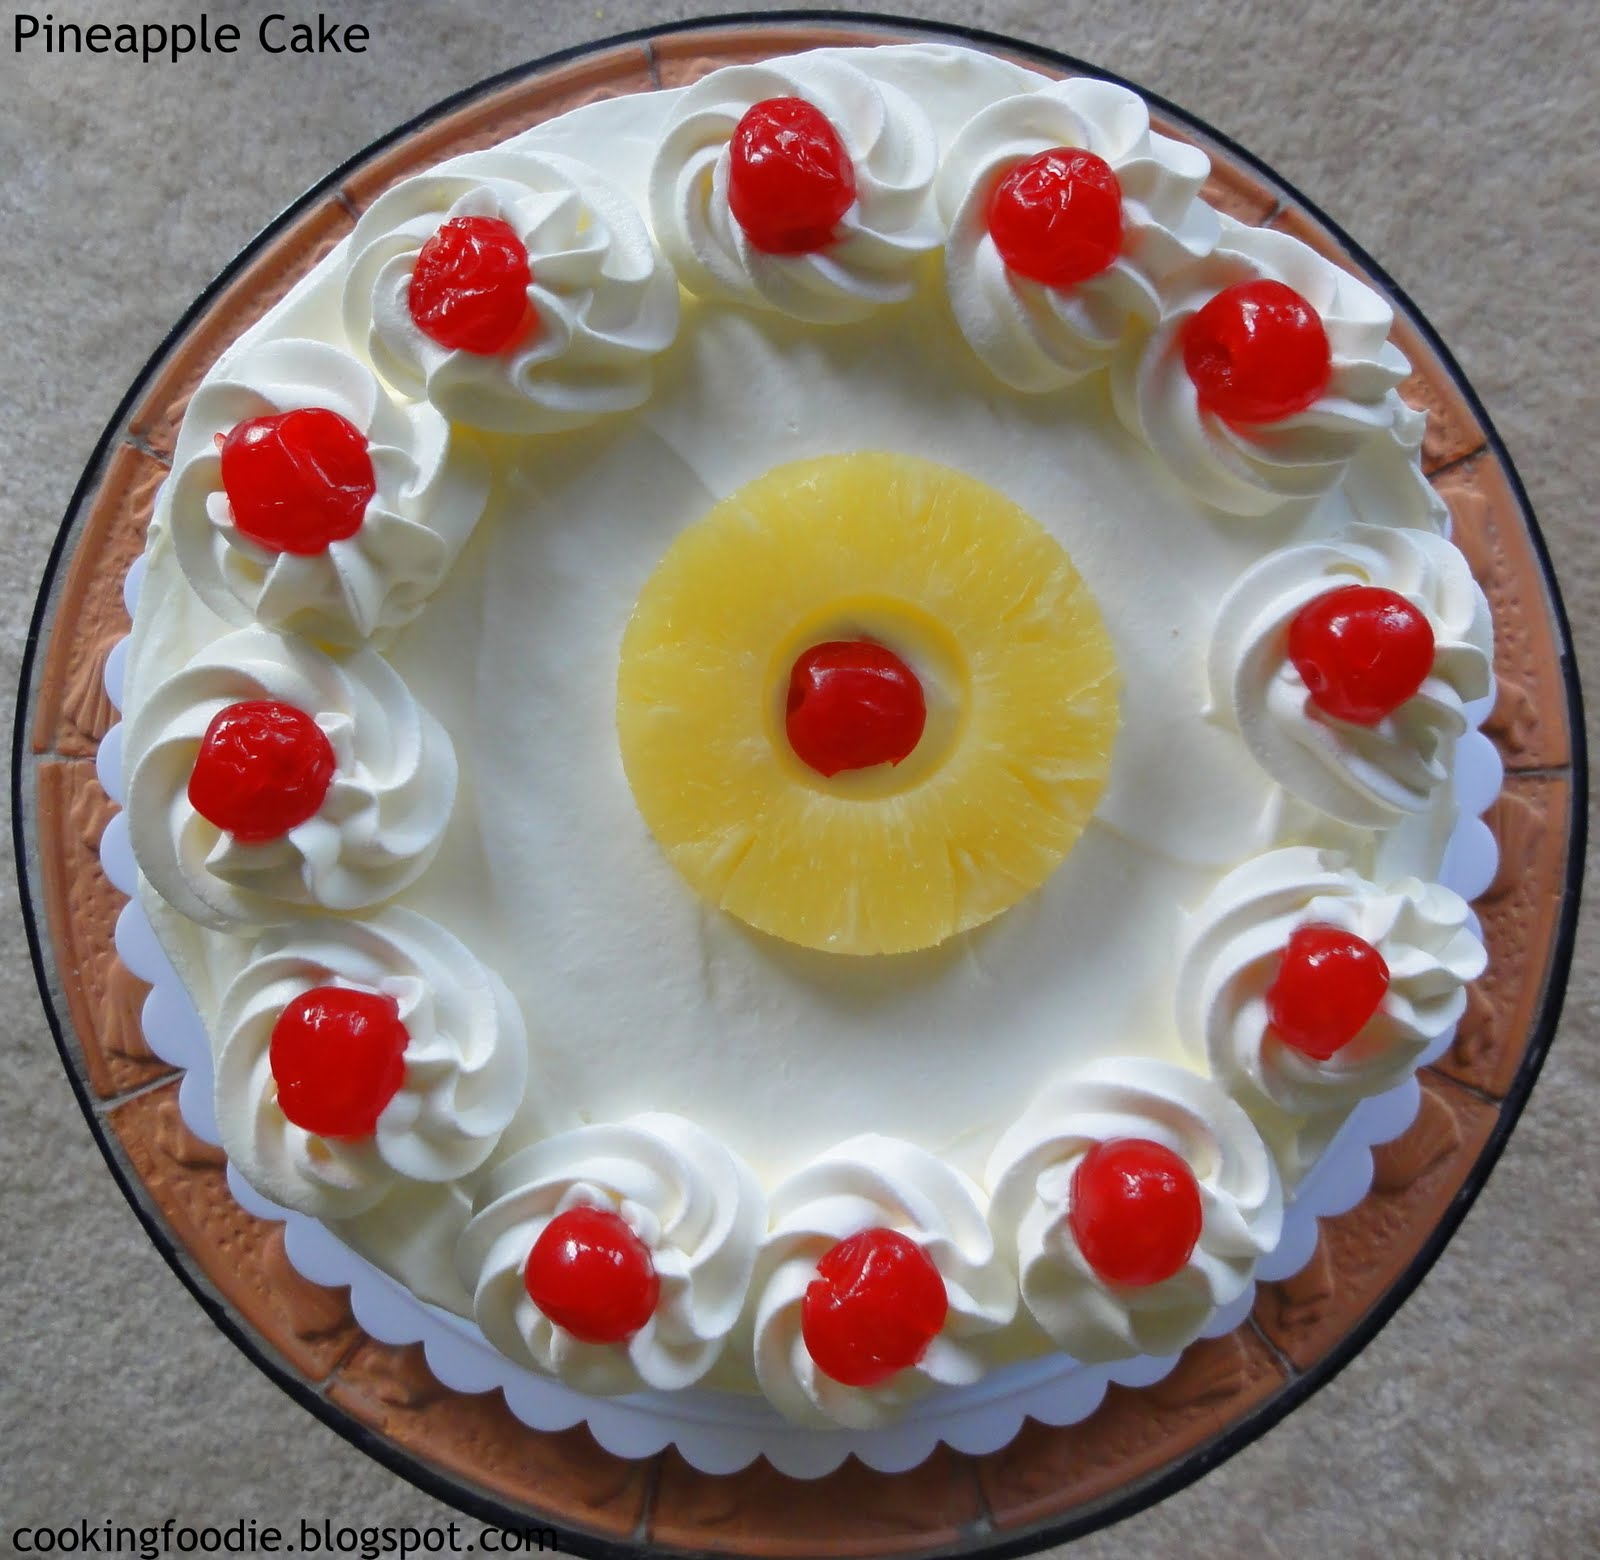 http://2.bp.blogspot.com/-d4E-dcsG0bY/T077vrKfOcI/AAAAAAAAB7I/SzERwl4sBjI/s1600/pineapple+cake+upload.jpg